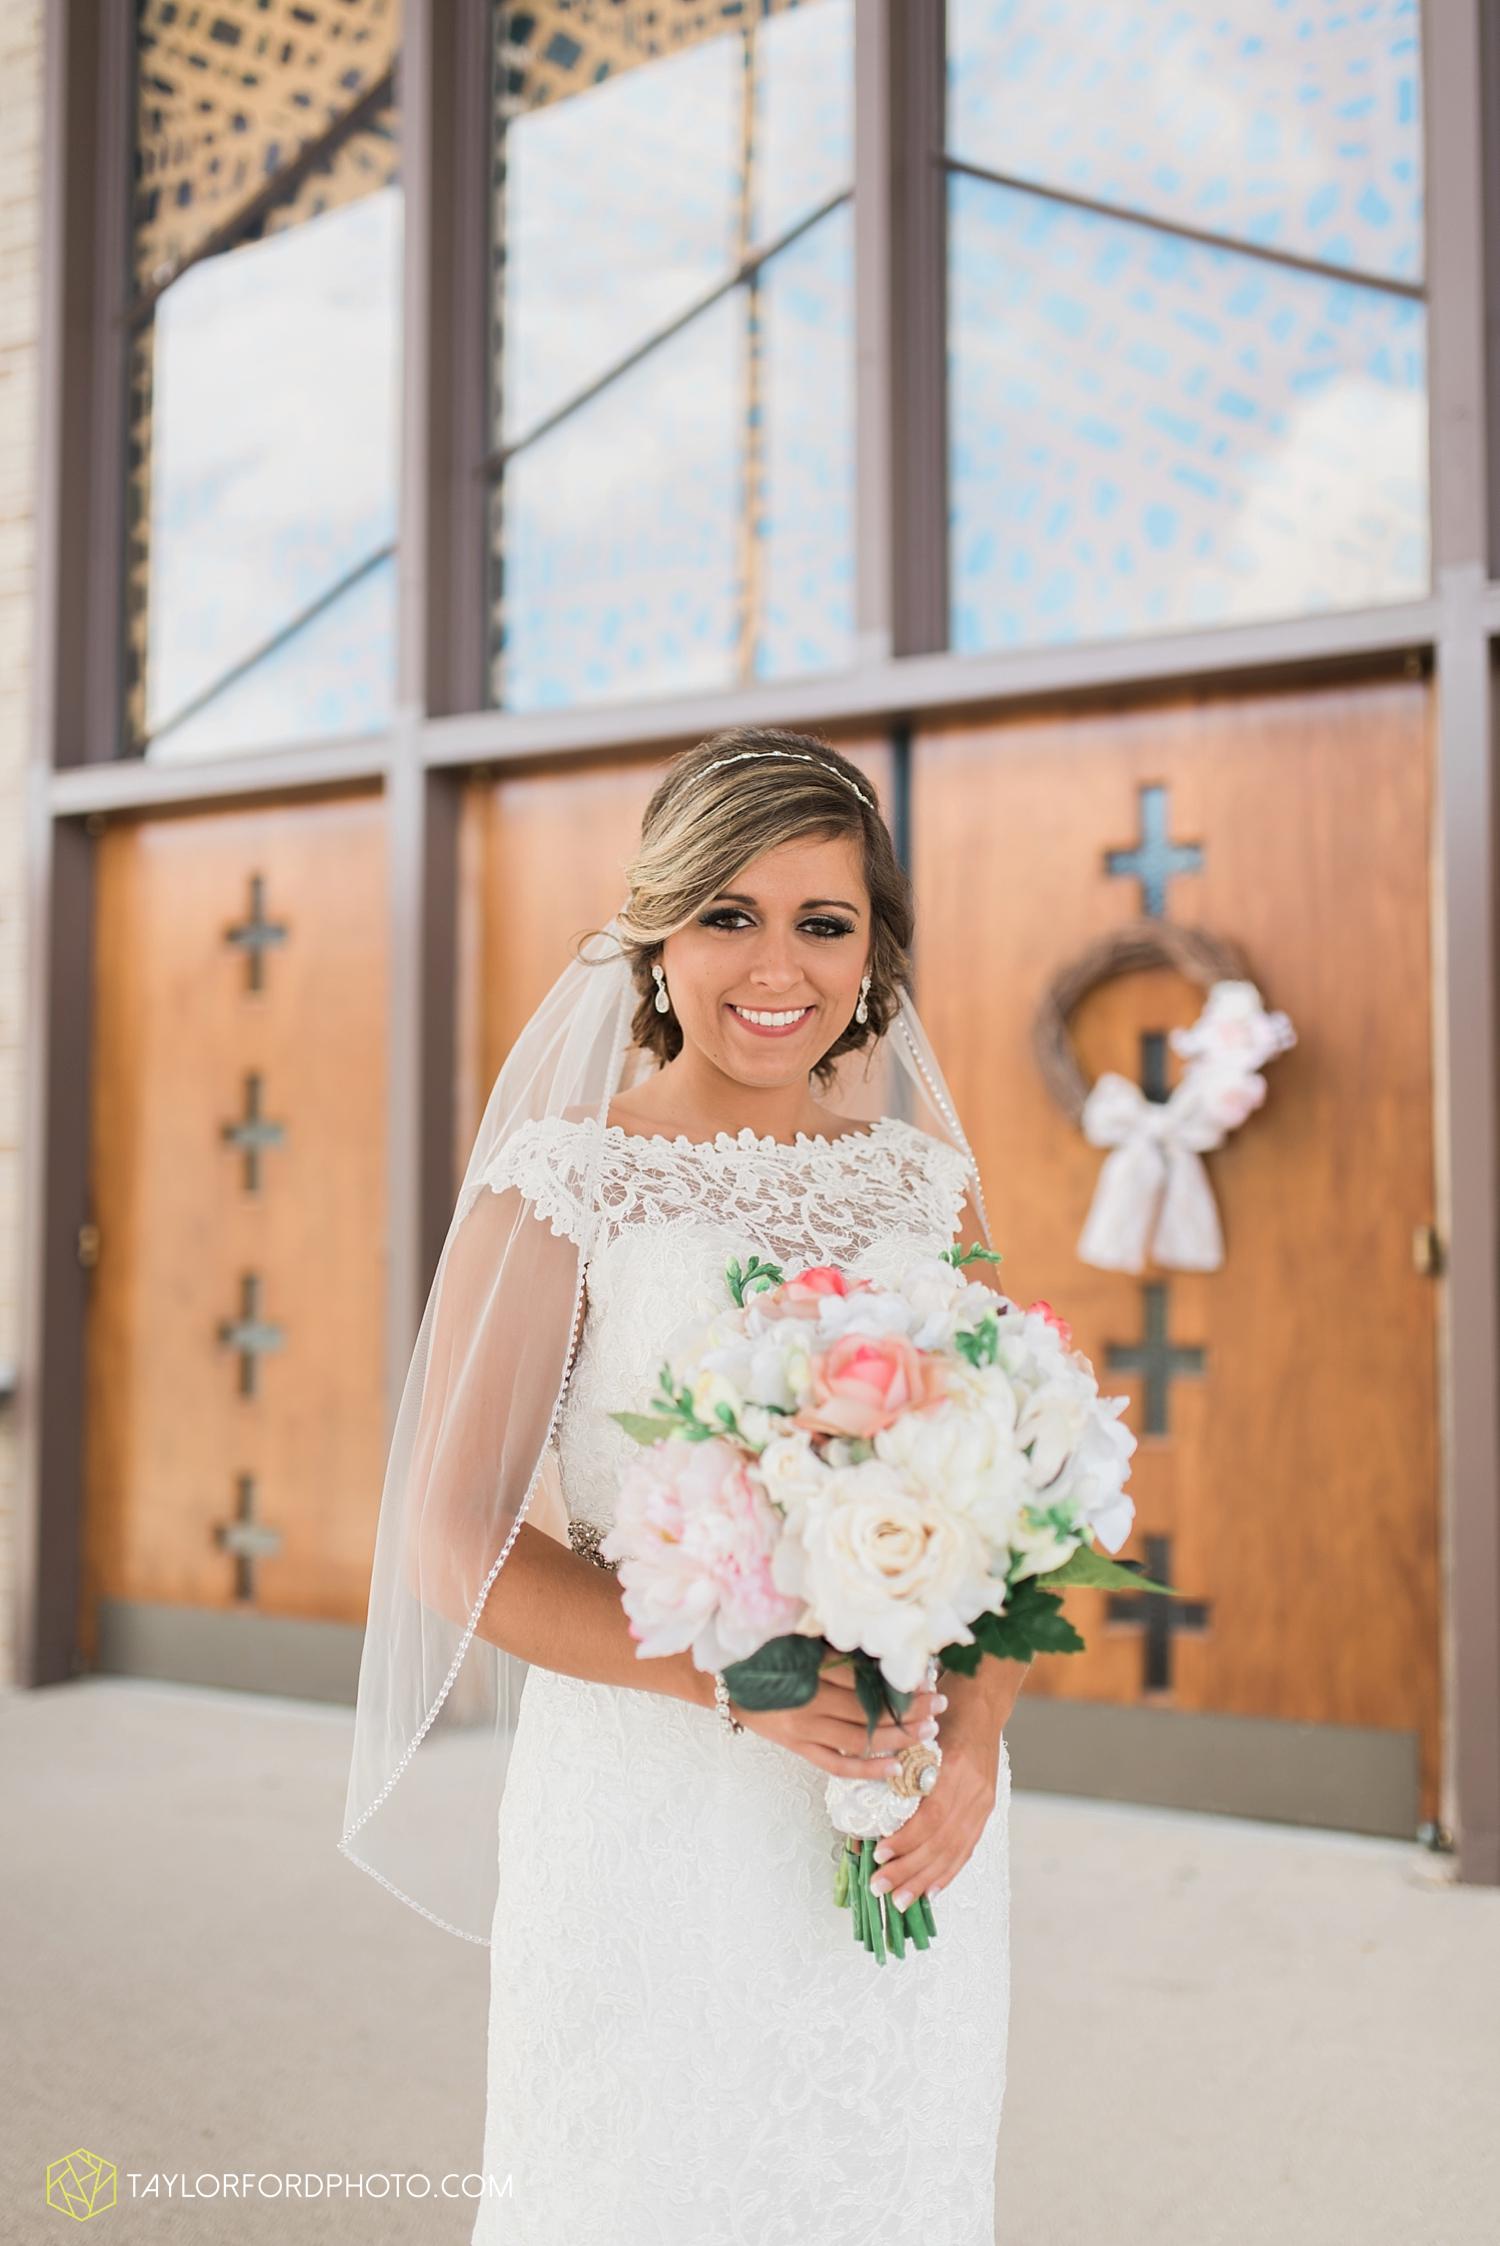 van_wert_wedding_photographer_taylor_ford_ohio_indiana_fort_wayne_2087.jpg